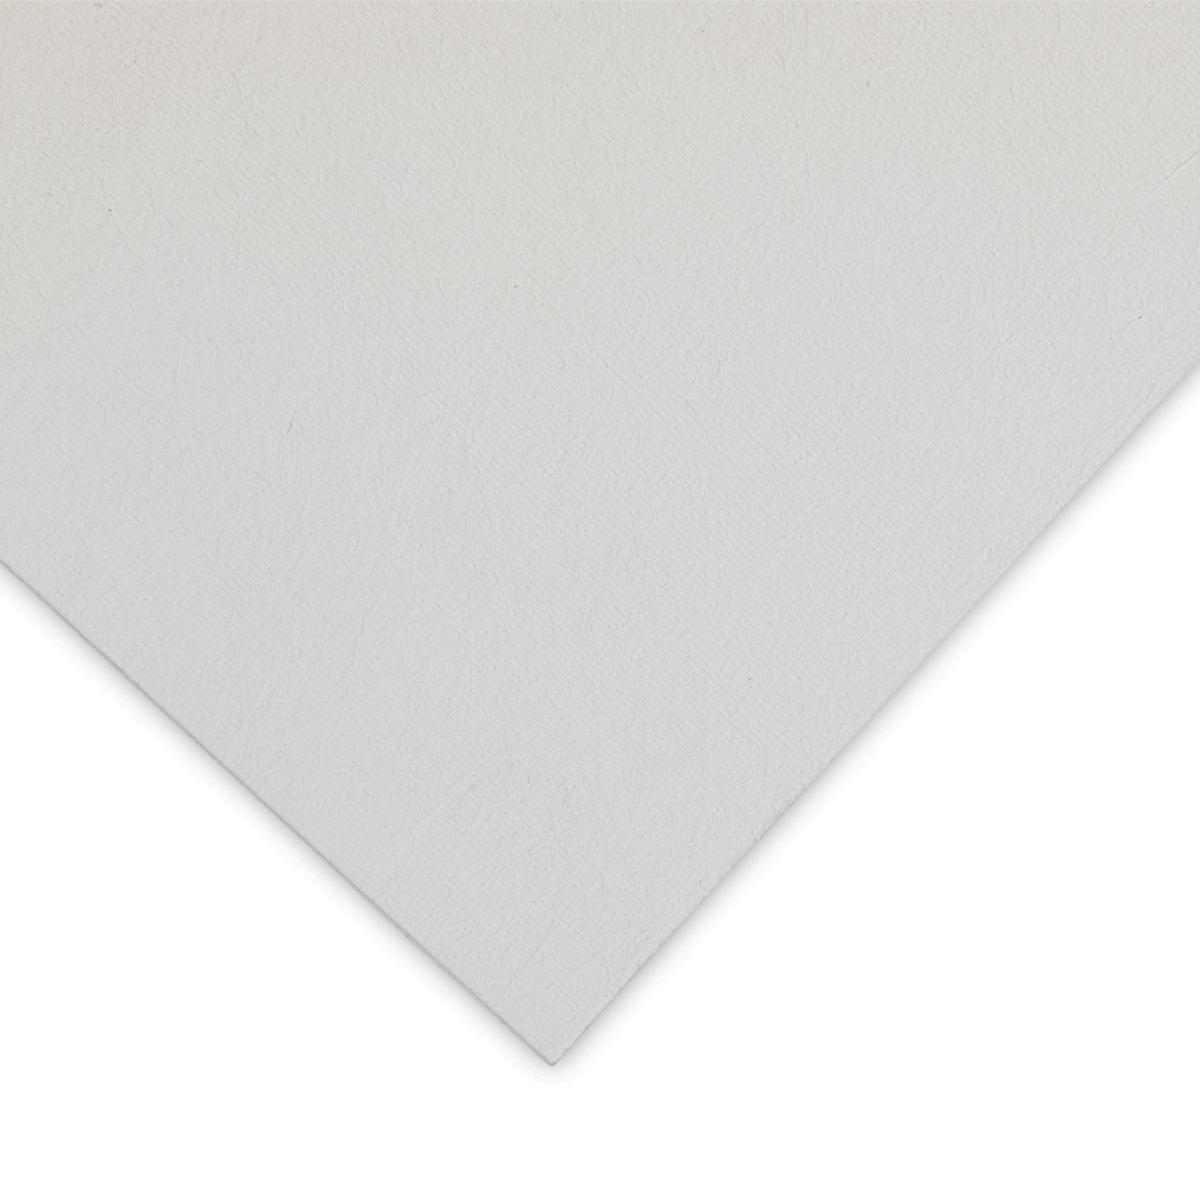 Evolon AP Paper - 8-1/2 x 11, 168 gsm, Pkg of 10 Sheets